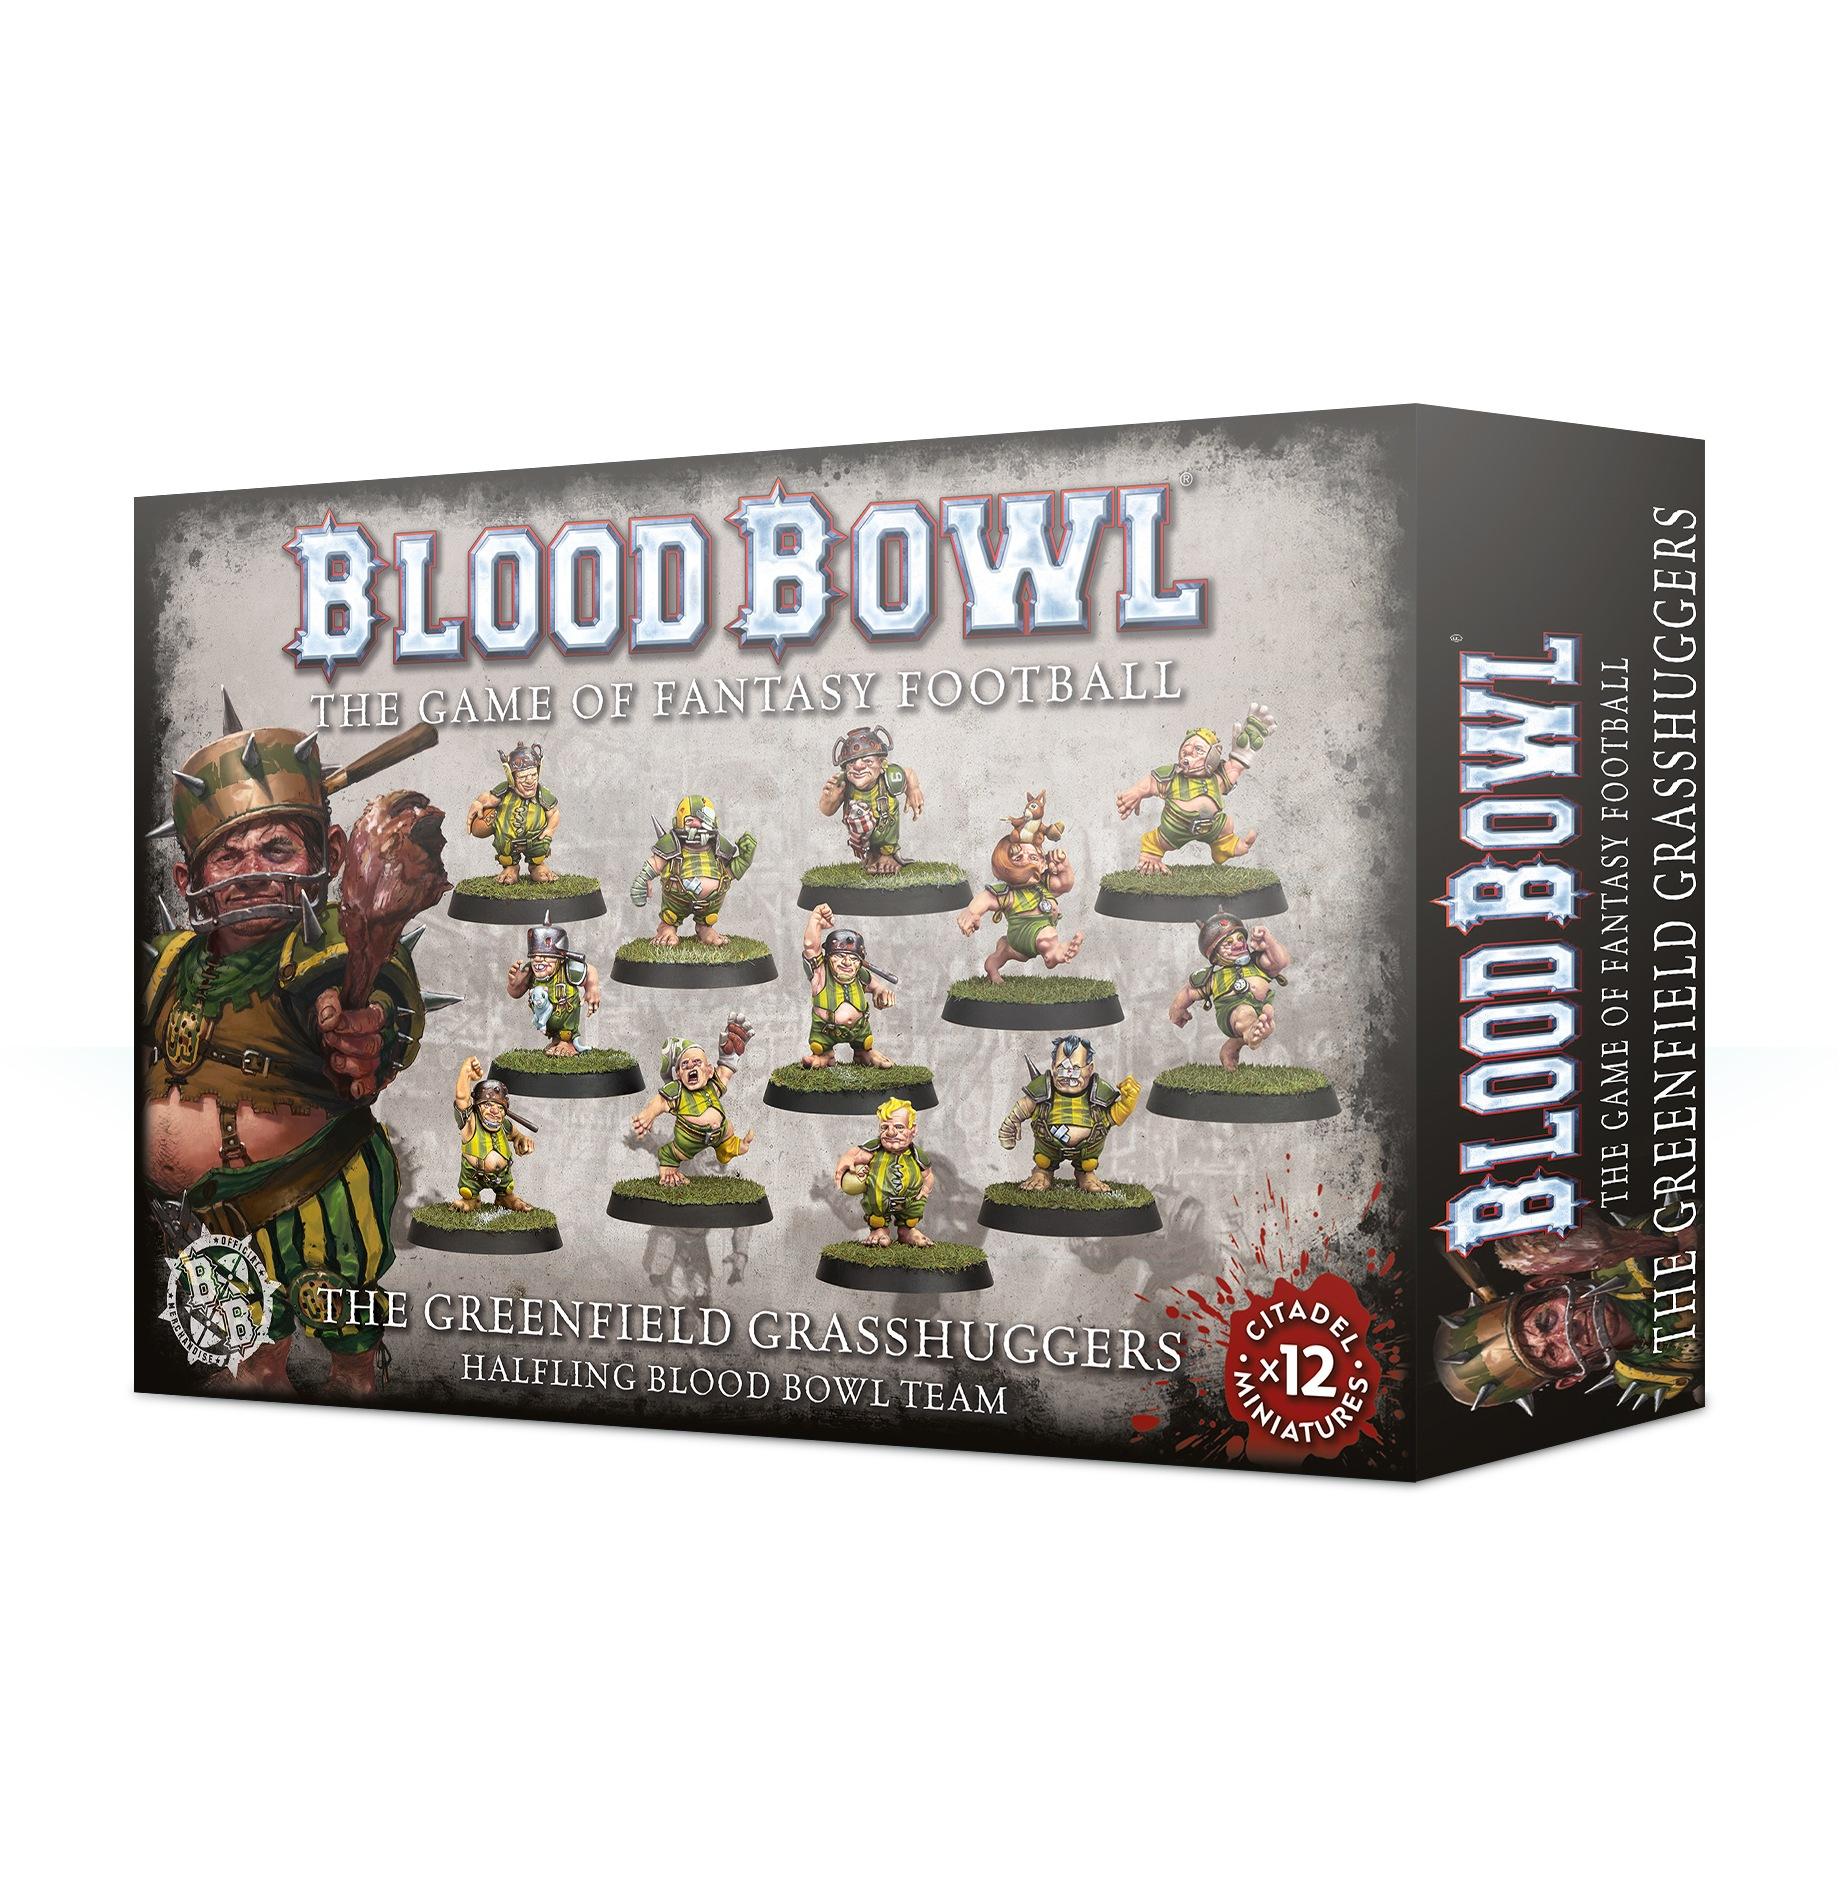 The Greenfield Grasshuggers - Halfling Blood Bowl Team